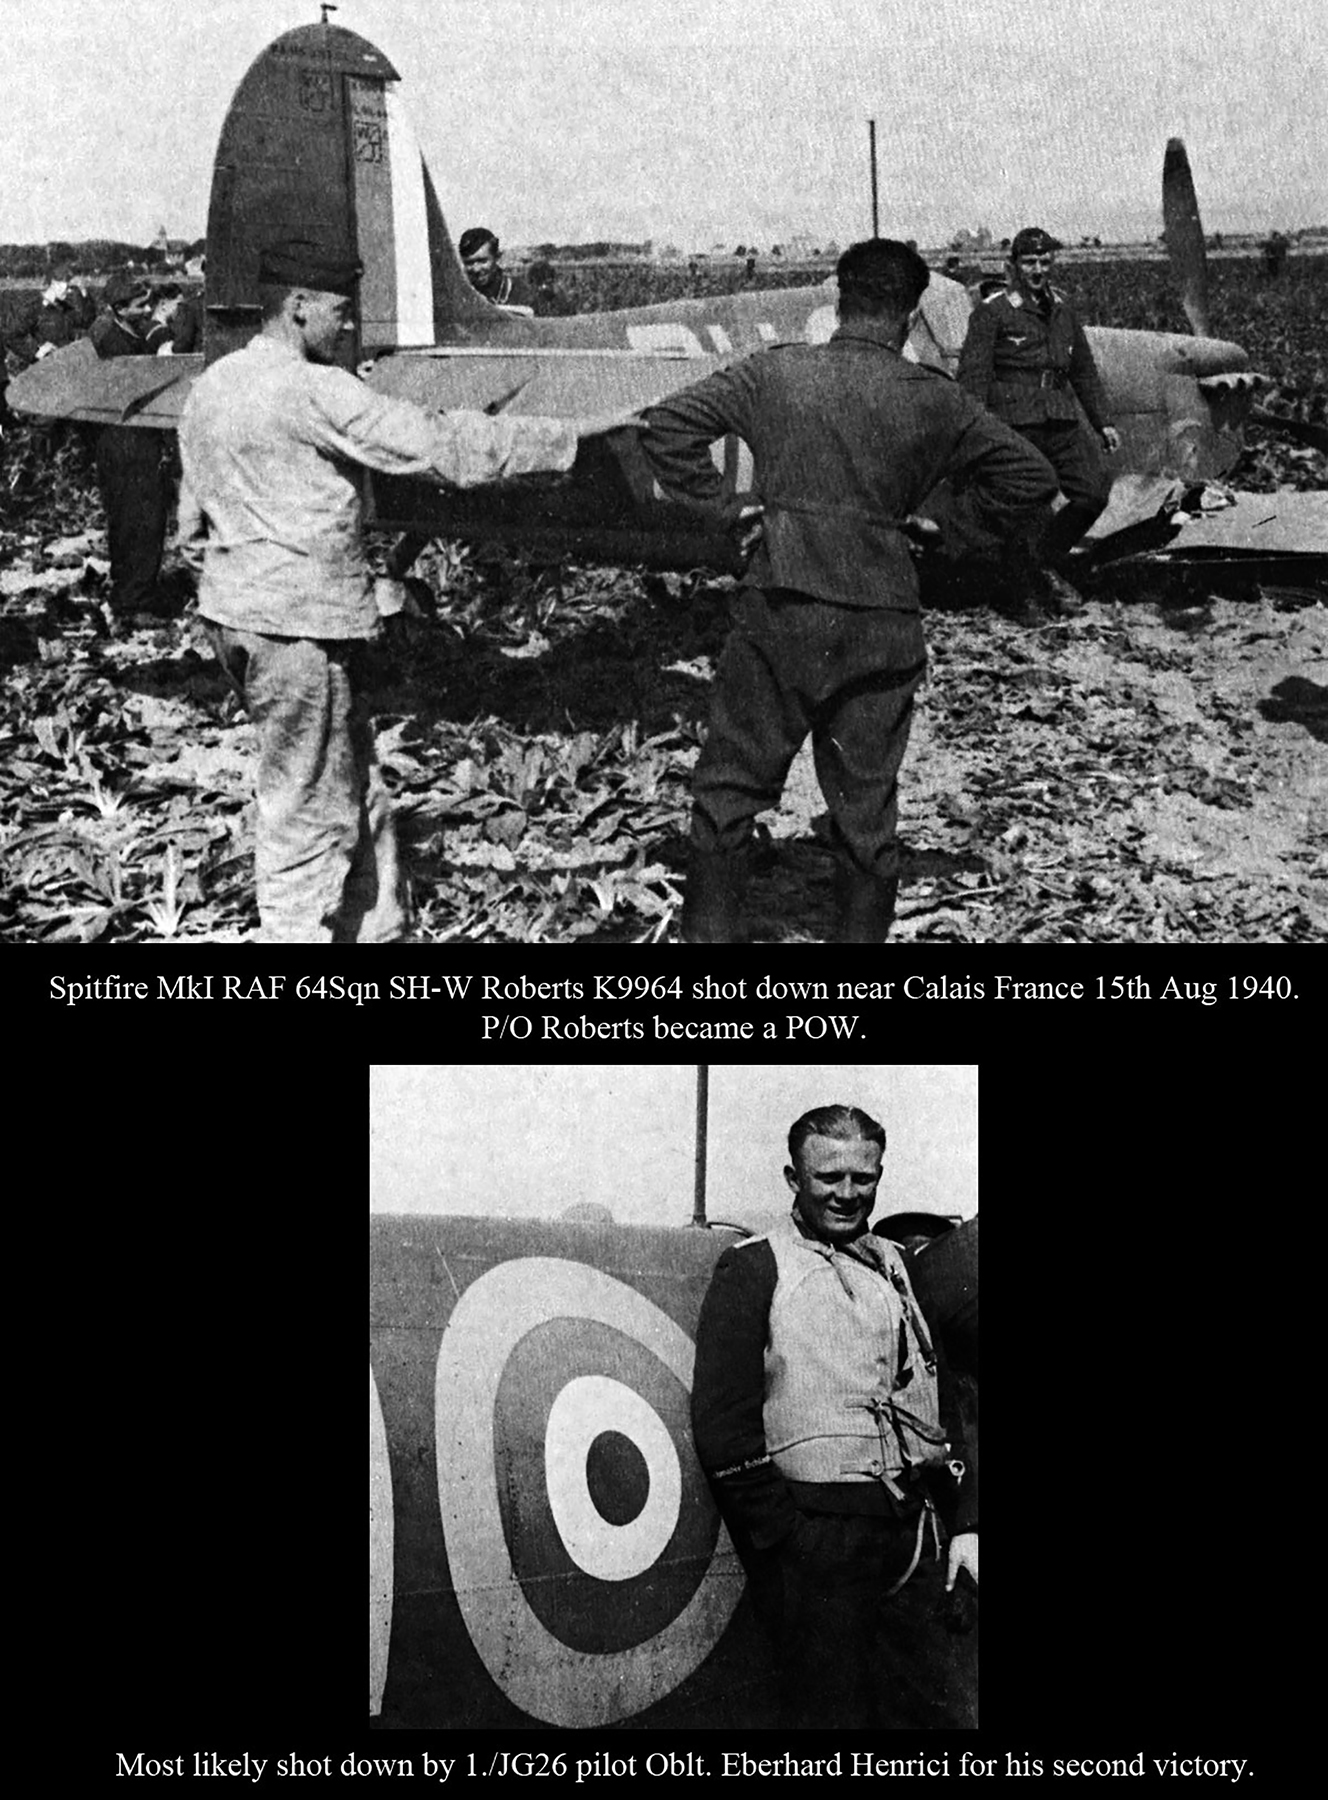 Spitfire MkIa RAF 64Sqn SHW Roberts K9964 shot down Calais France 14th Aug 1940